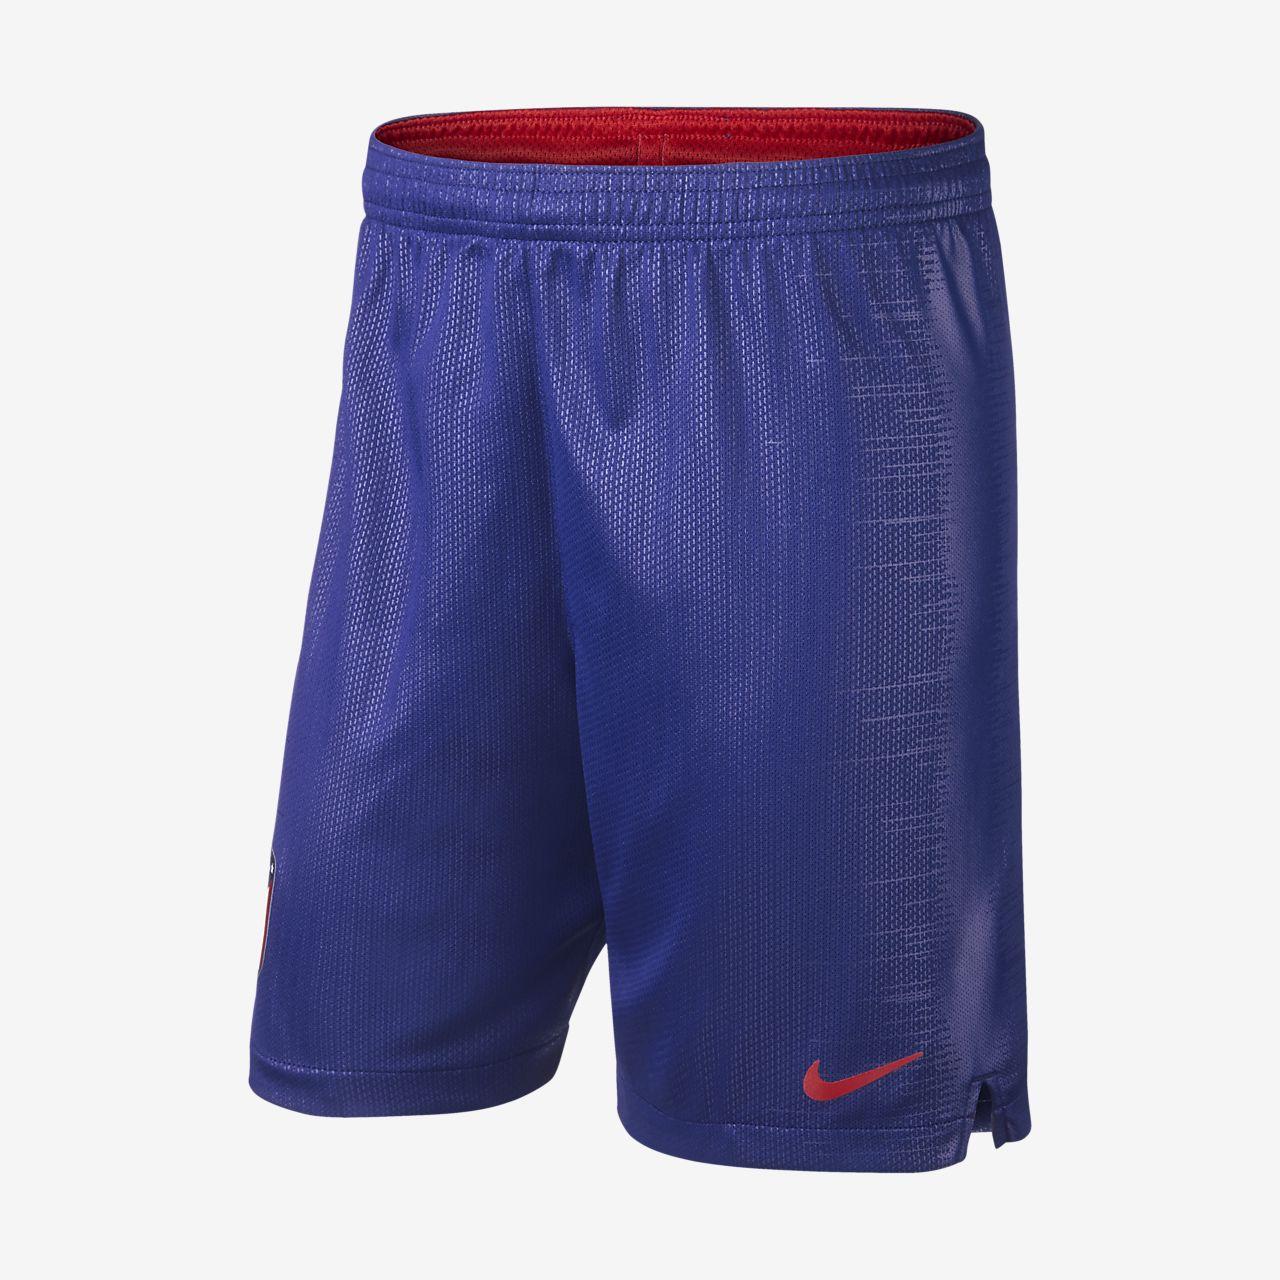 2018/19 Atletico de Madrid Stadium Home/Away Older Kids' Football Shorts